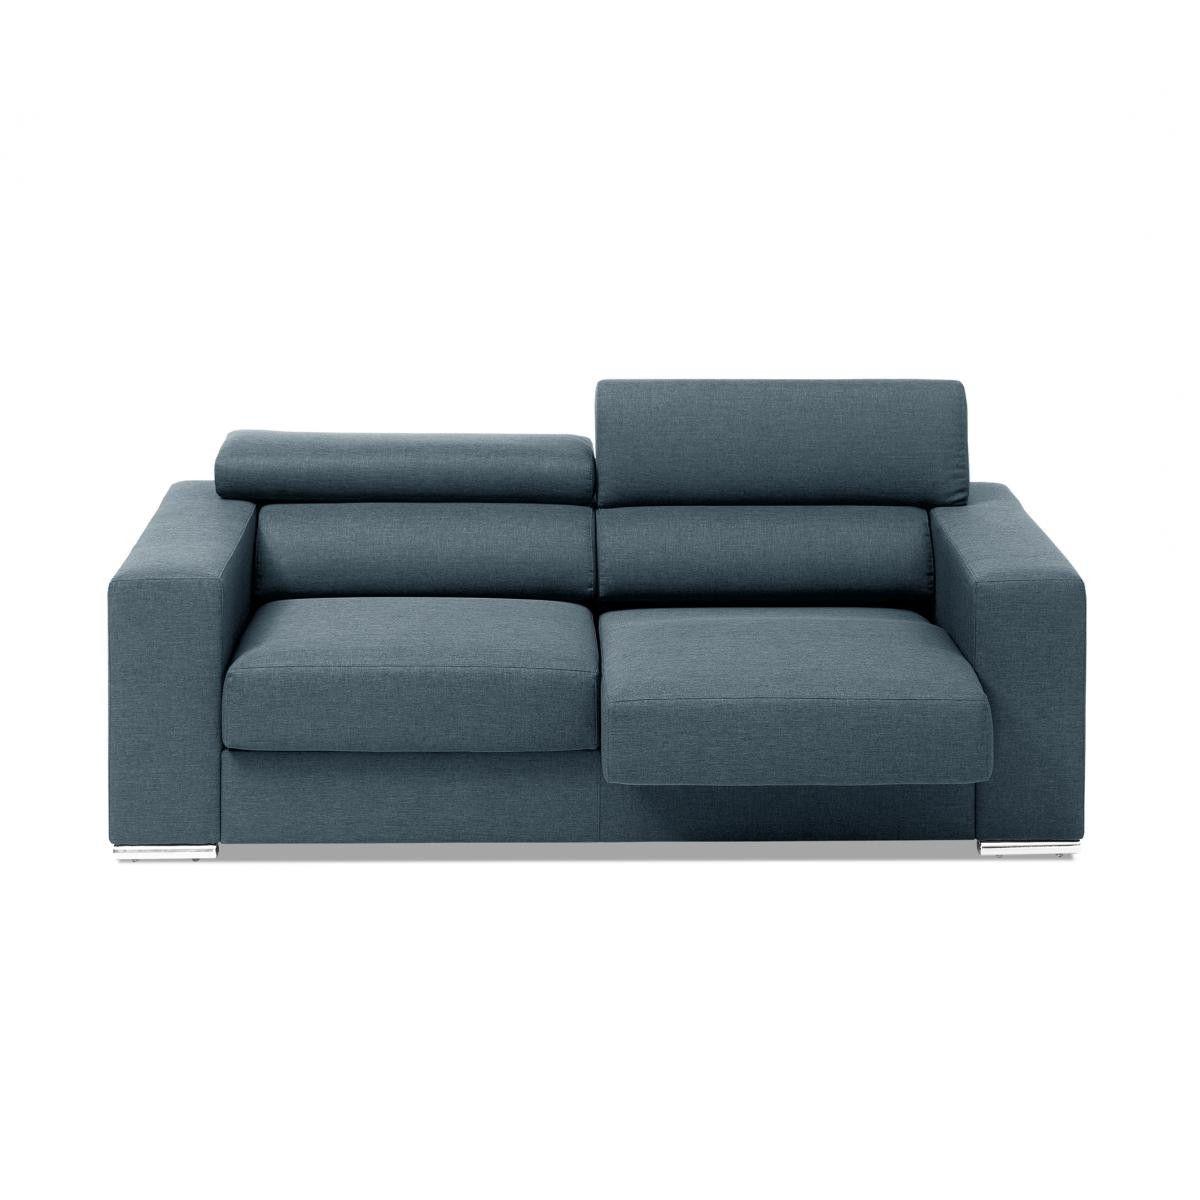 Sofa 2 Plazas Conforama 0gdr sofà 2 Plazas Newton En Conforama Sala Tv Pinterest Tvs